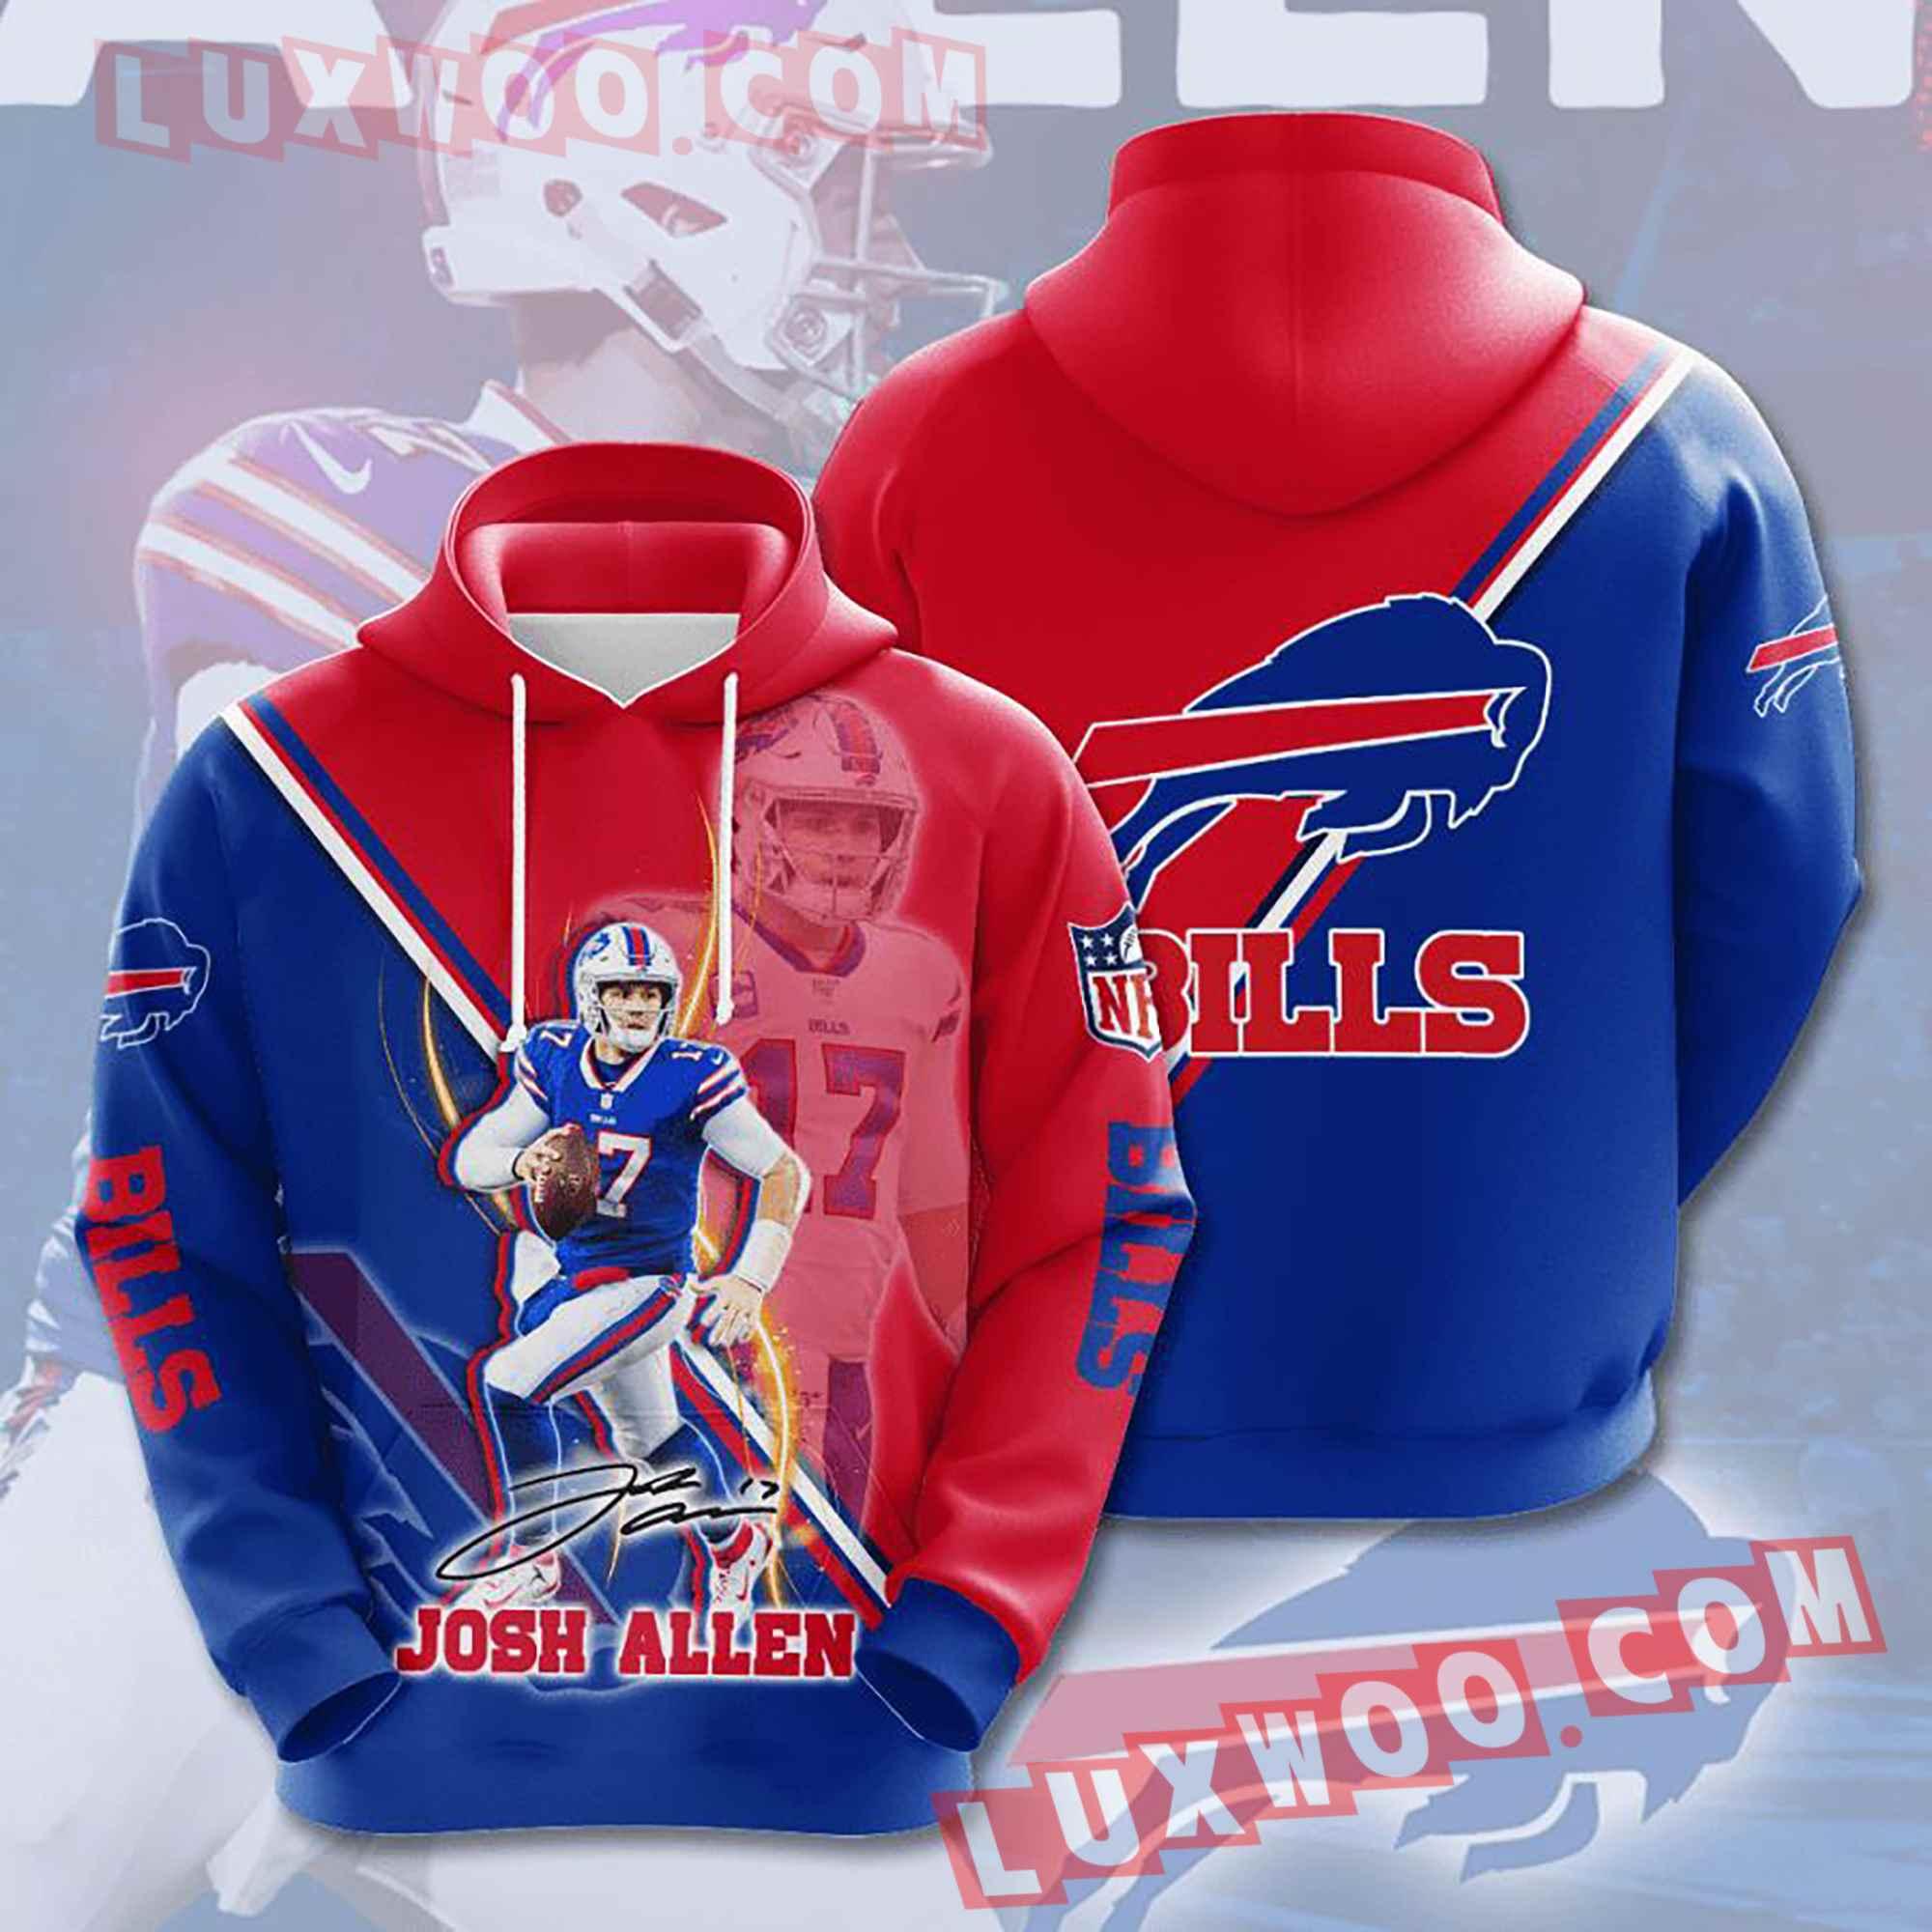 Nfl Buffalo Bills Hoodies Custom All Over Print 3d Pullover Hoodie V21